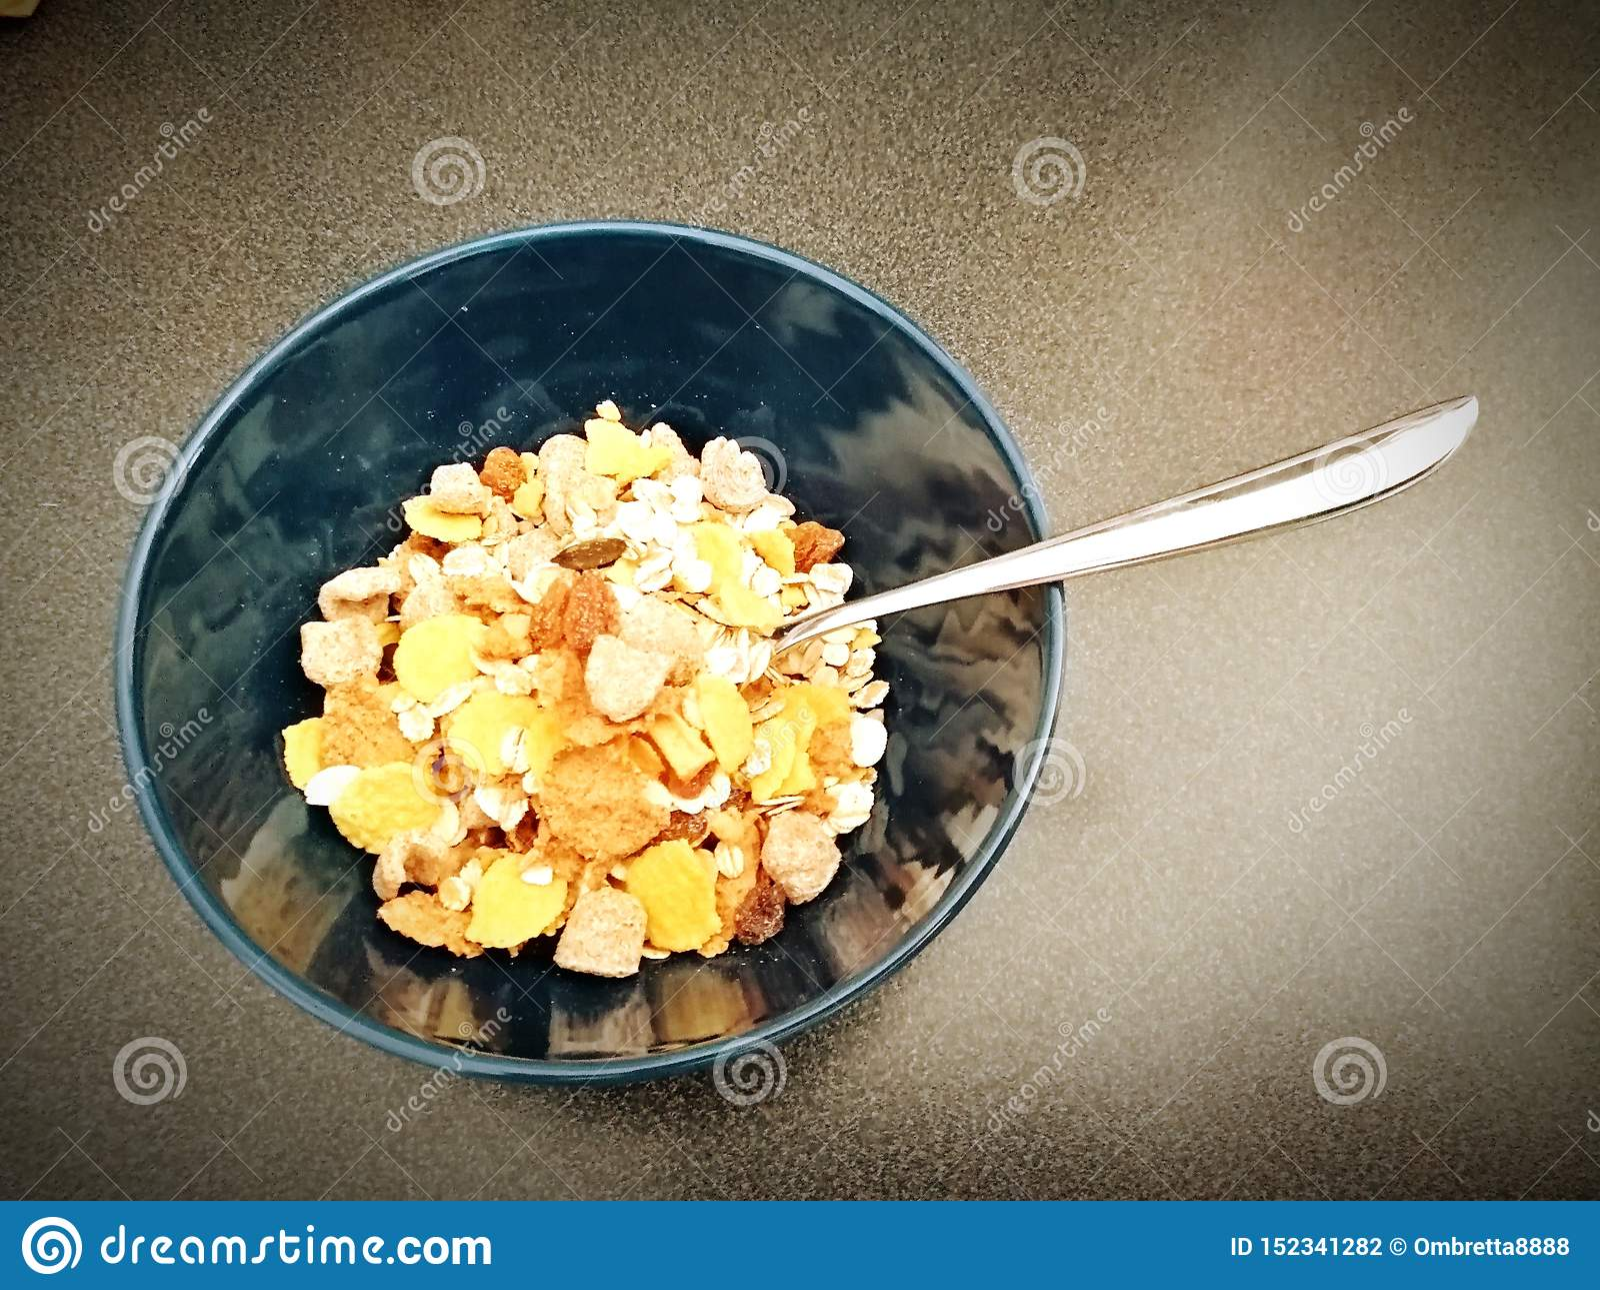 Oat flakes in a blue cup accompanied by a spoon to enjoy breakfast.